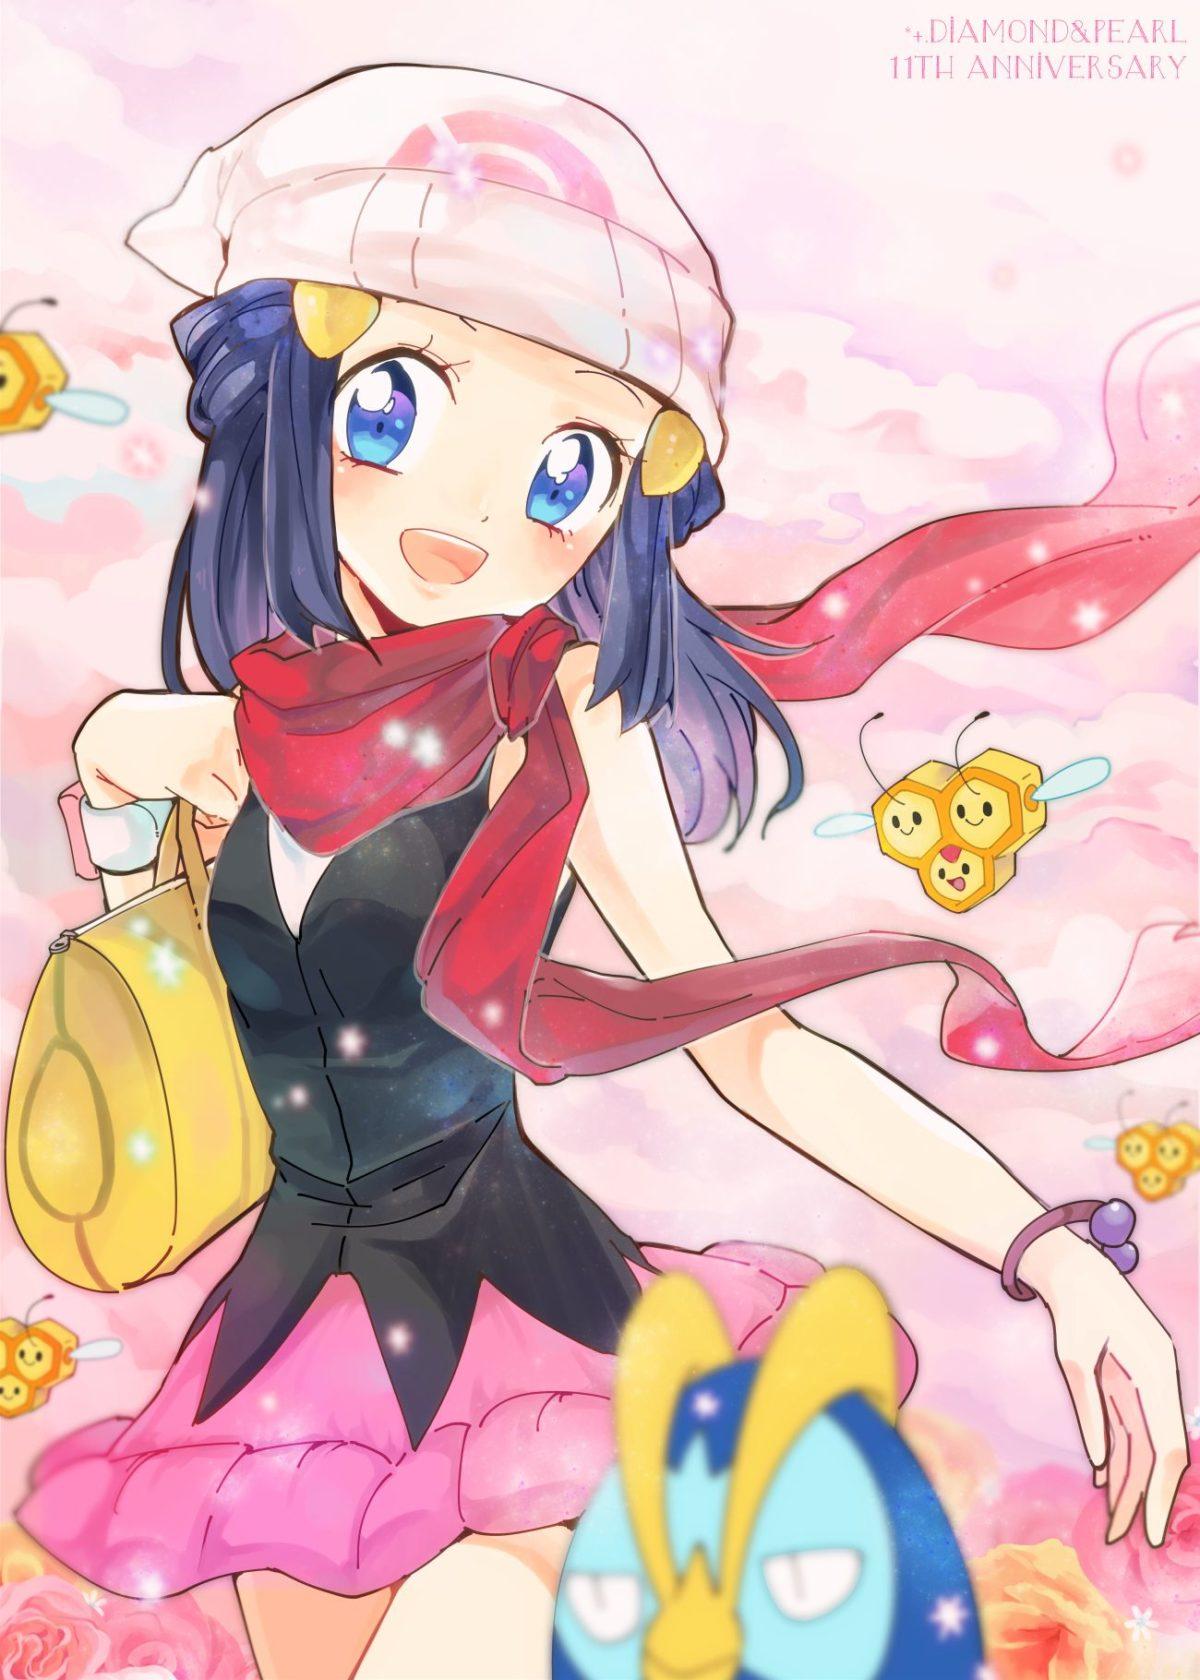 Combee – Pokémon | page 2 of 2 – Zerochan Anime Image Board